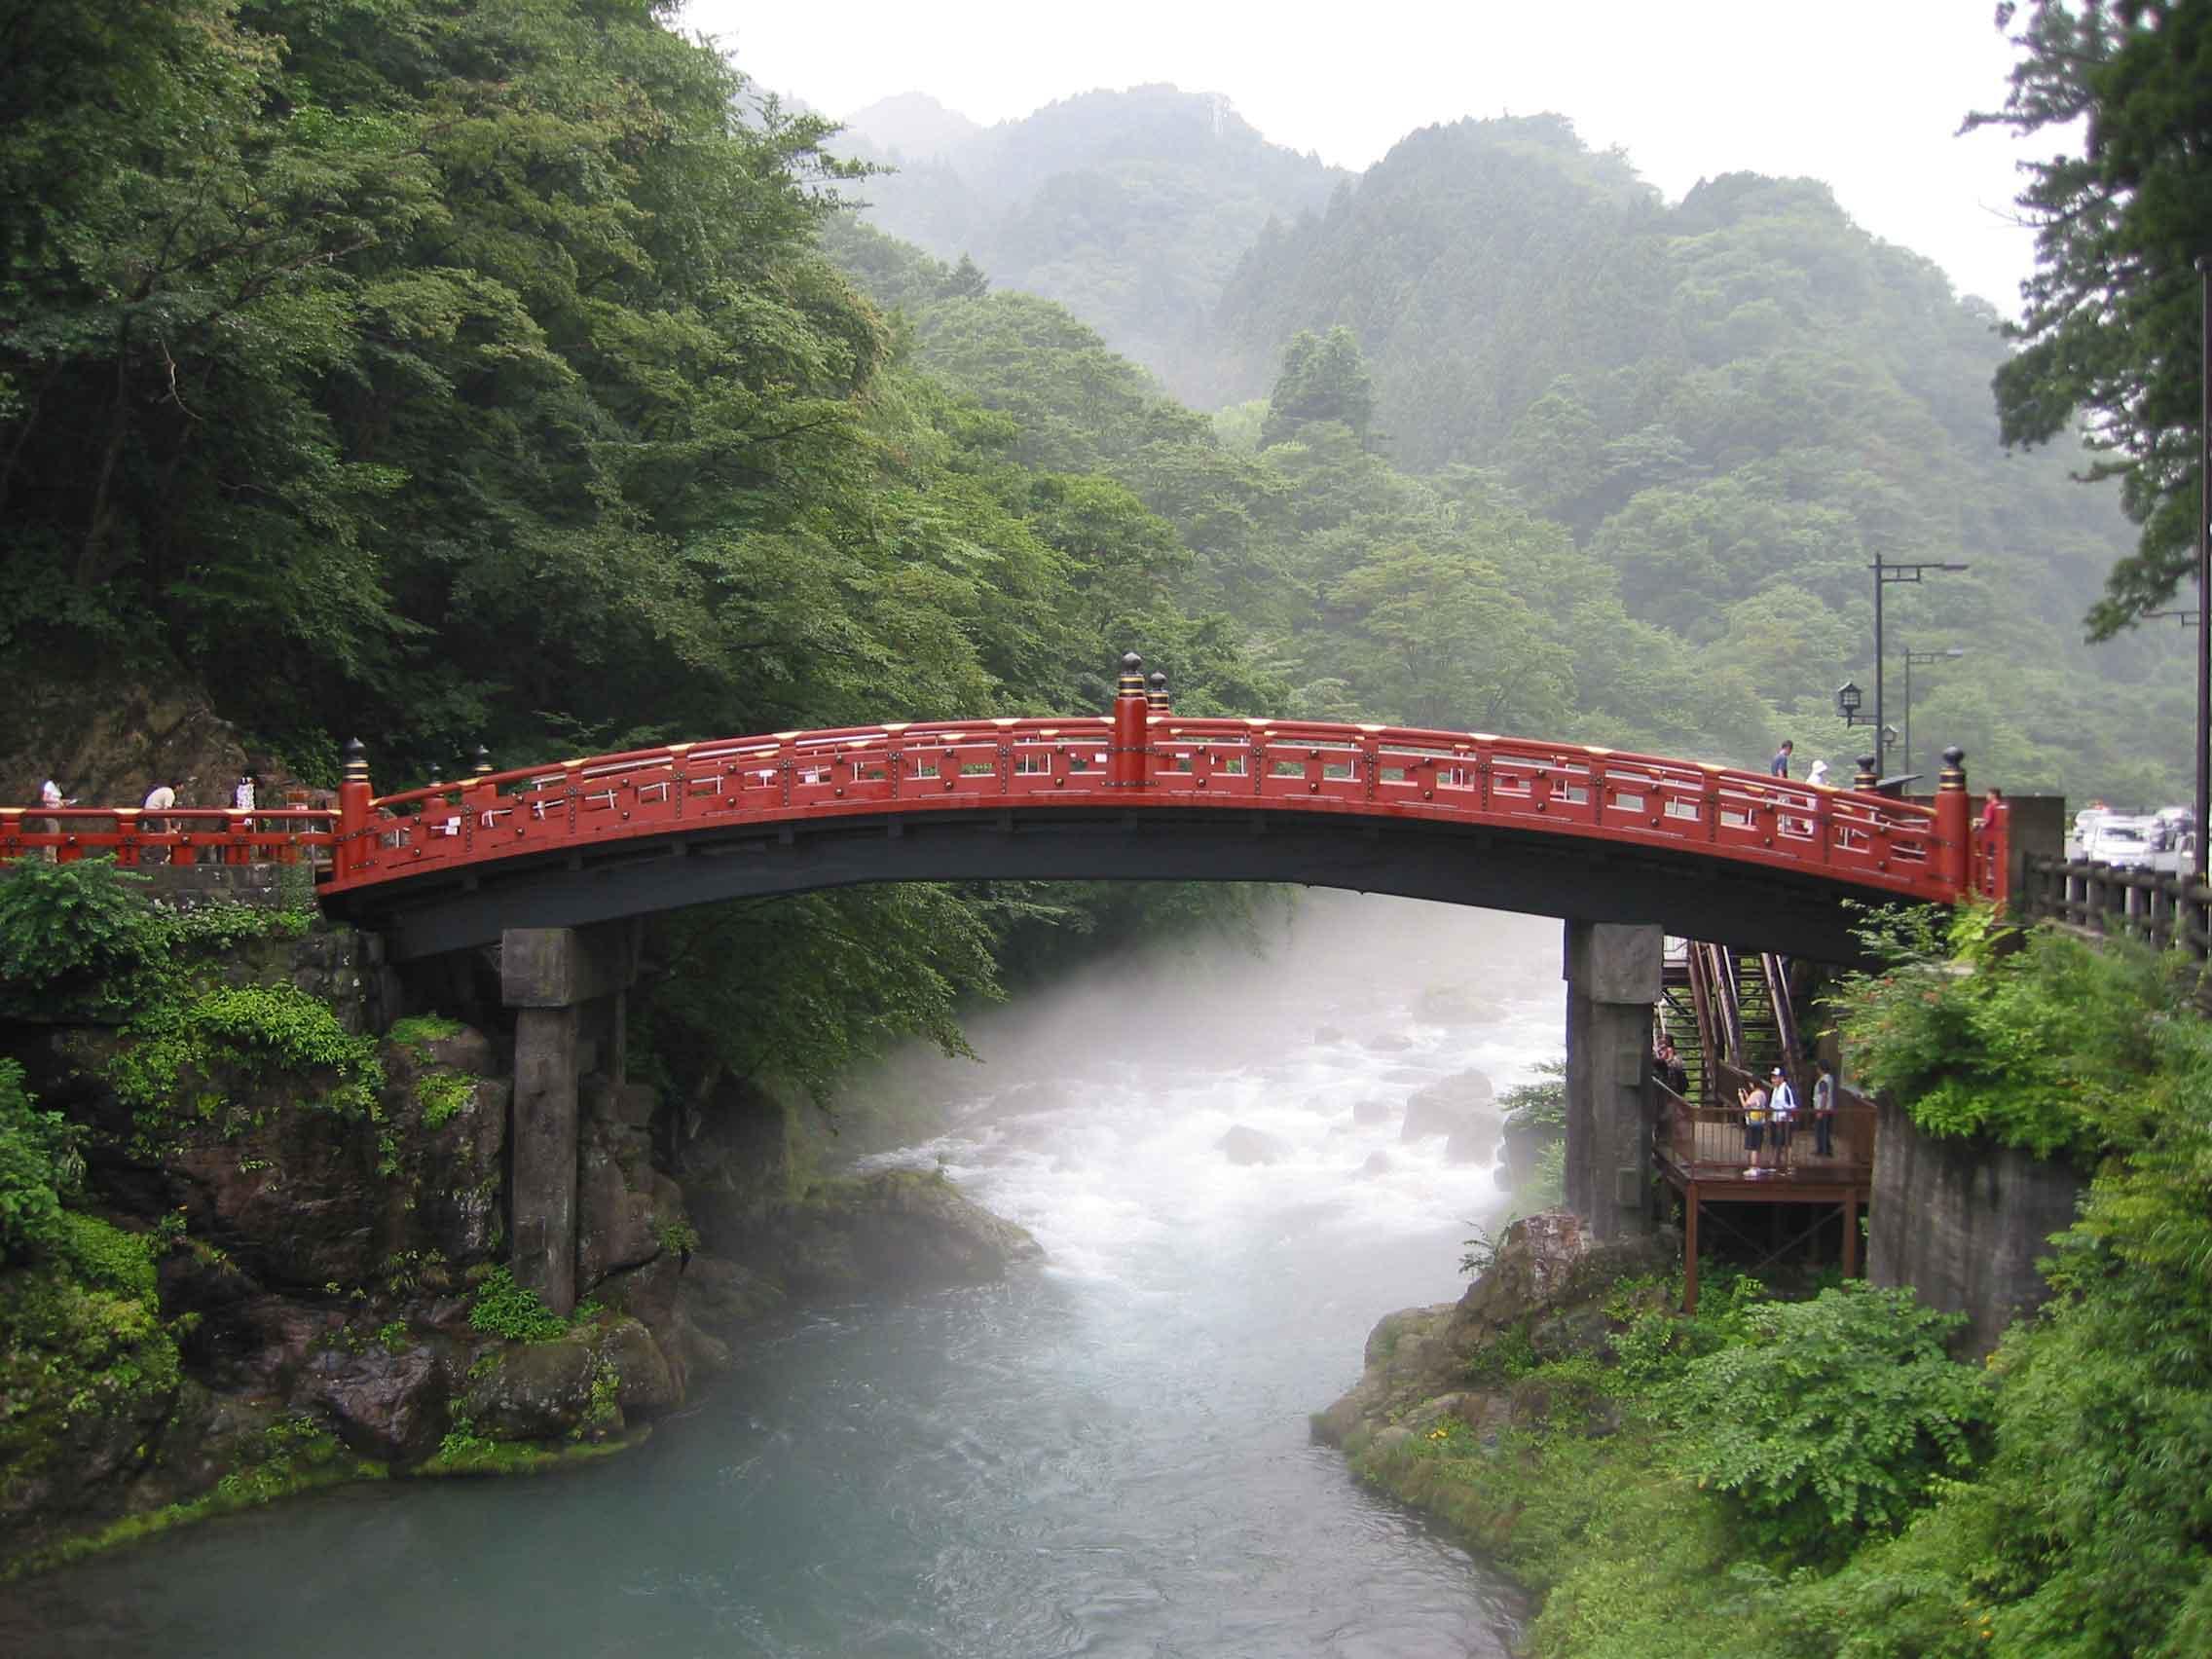 Shinkyo (Sacred Bridge), Nikko, Japan, by Paul Mannix